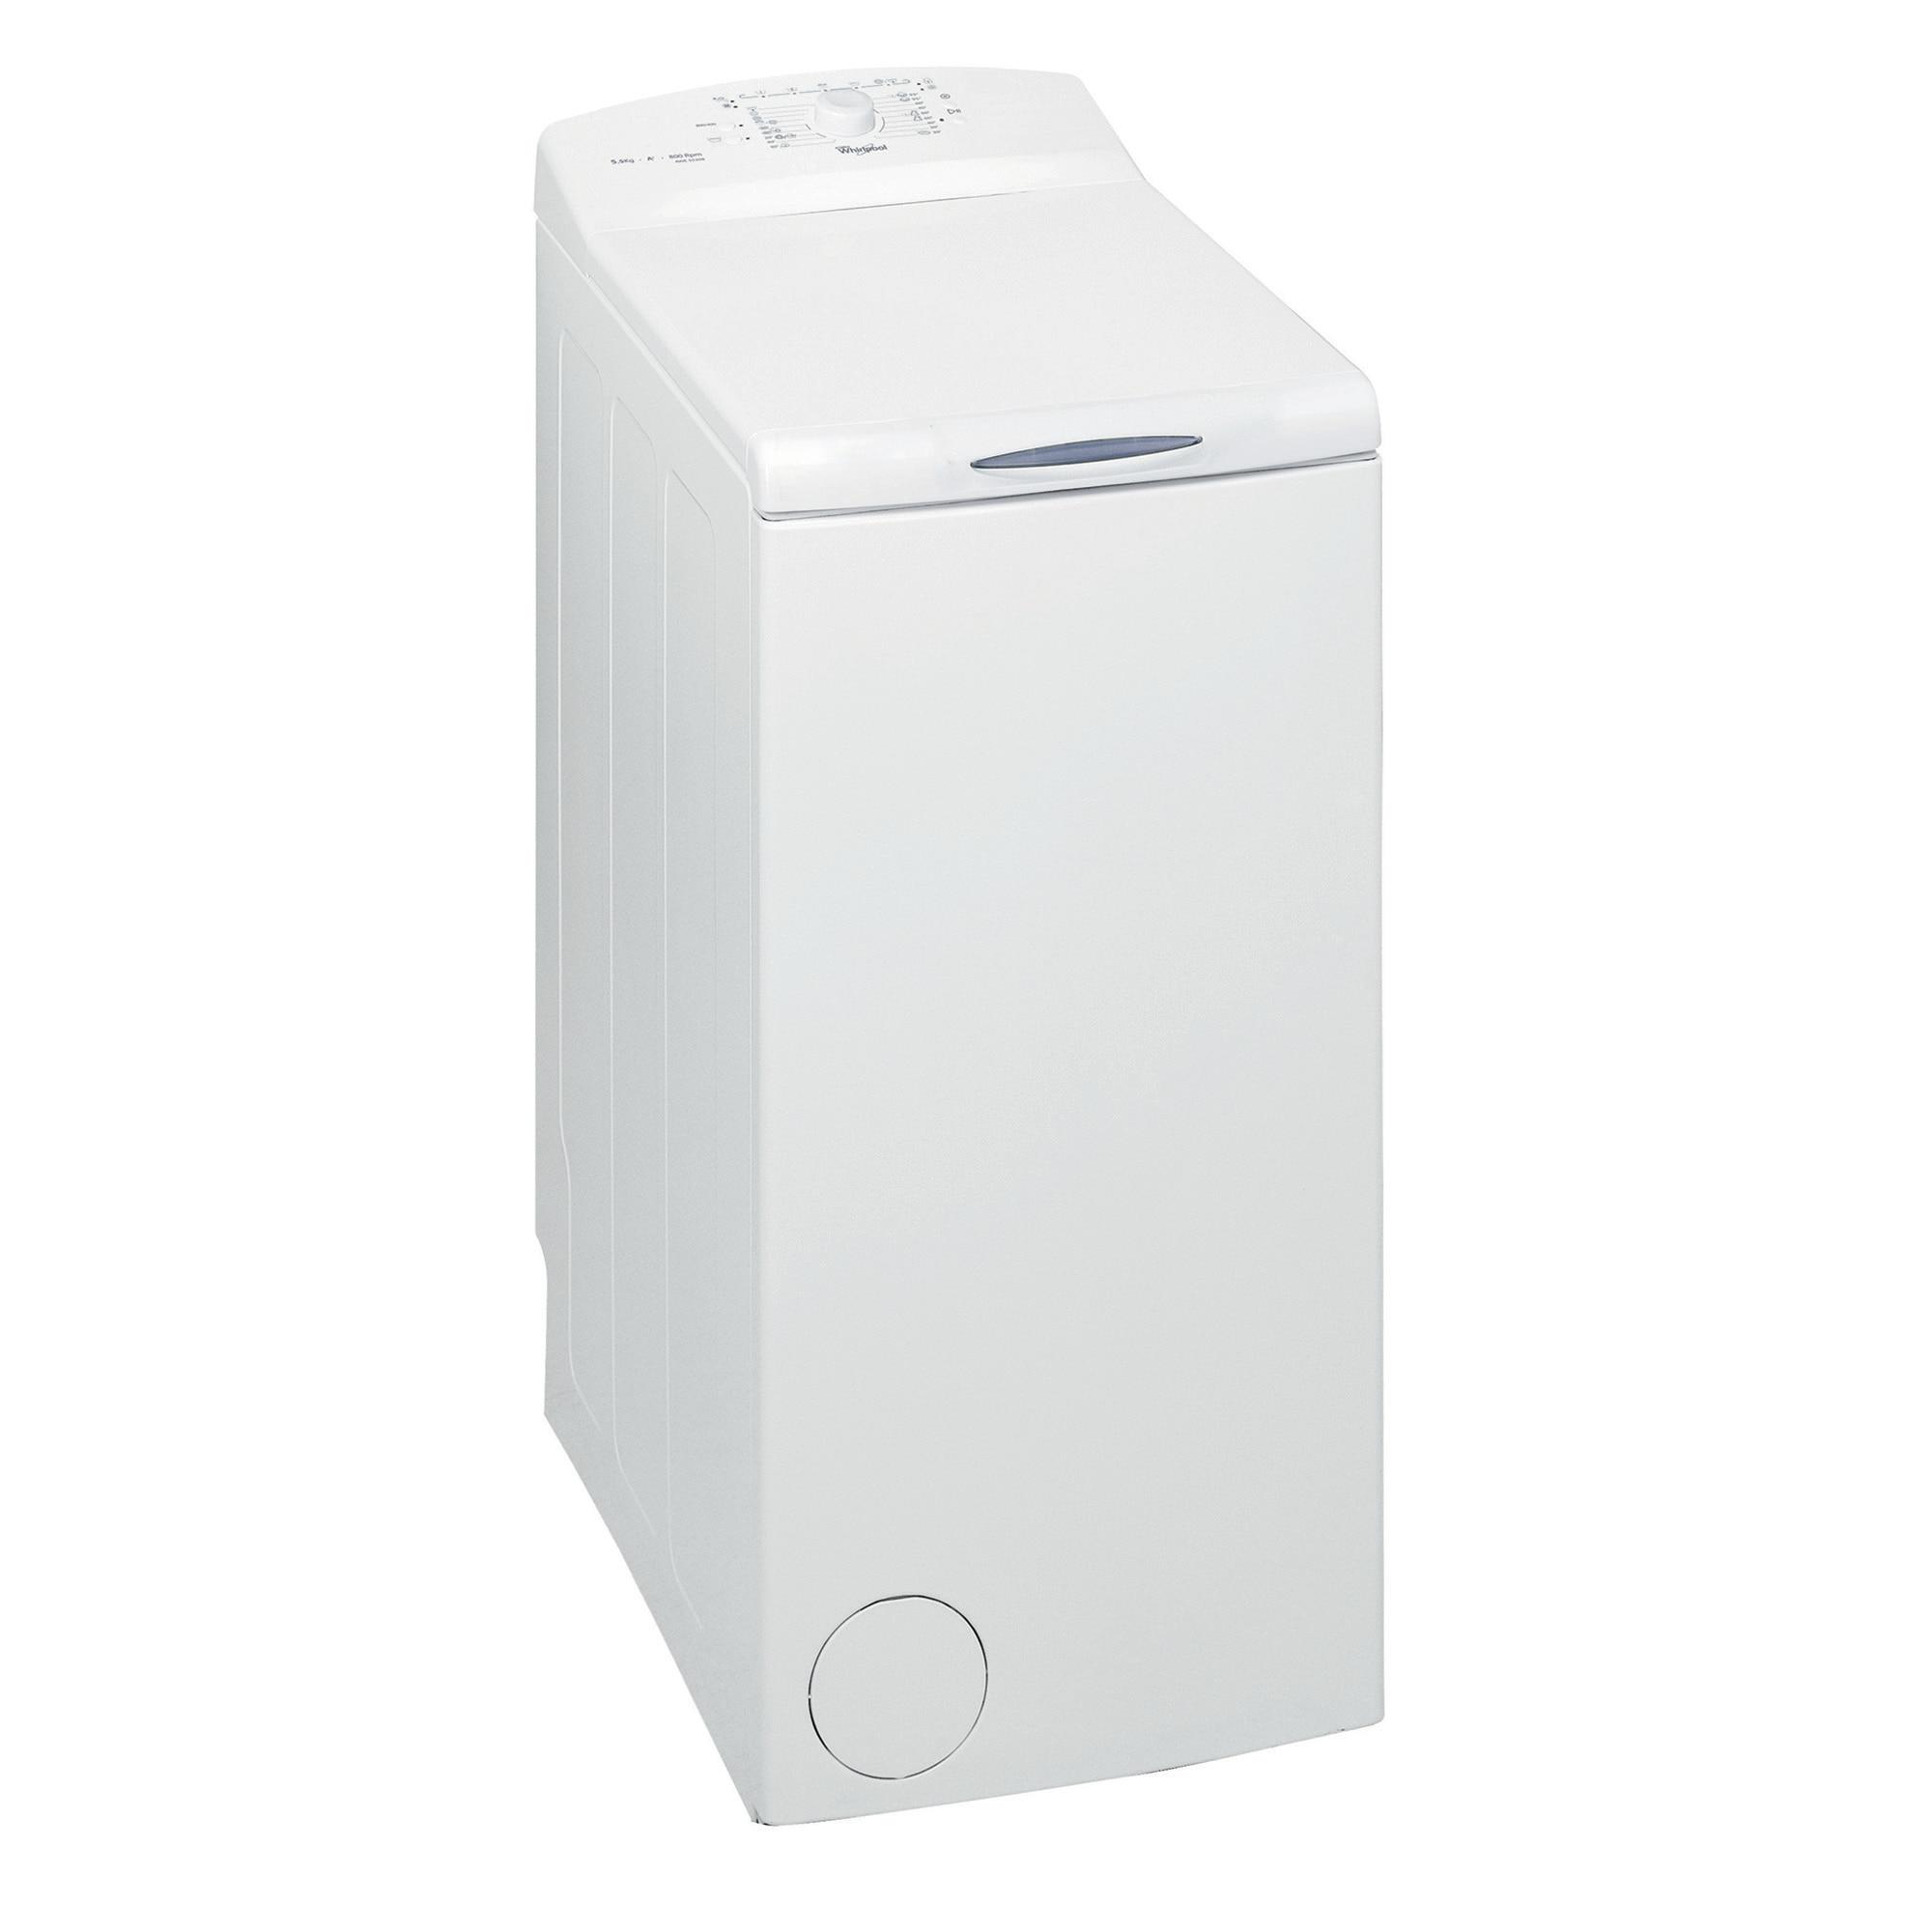 Fotografie Masina de spalat rufe cu incarcare verticala Whirlpool AWE 55208, 5.5 kg, 800 RPM, Display LED, Clasa A+, Alb